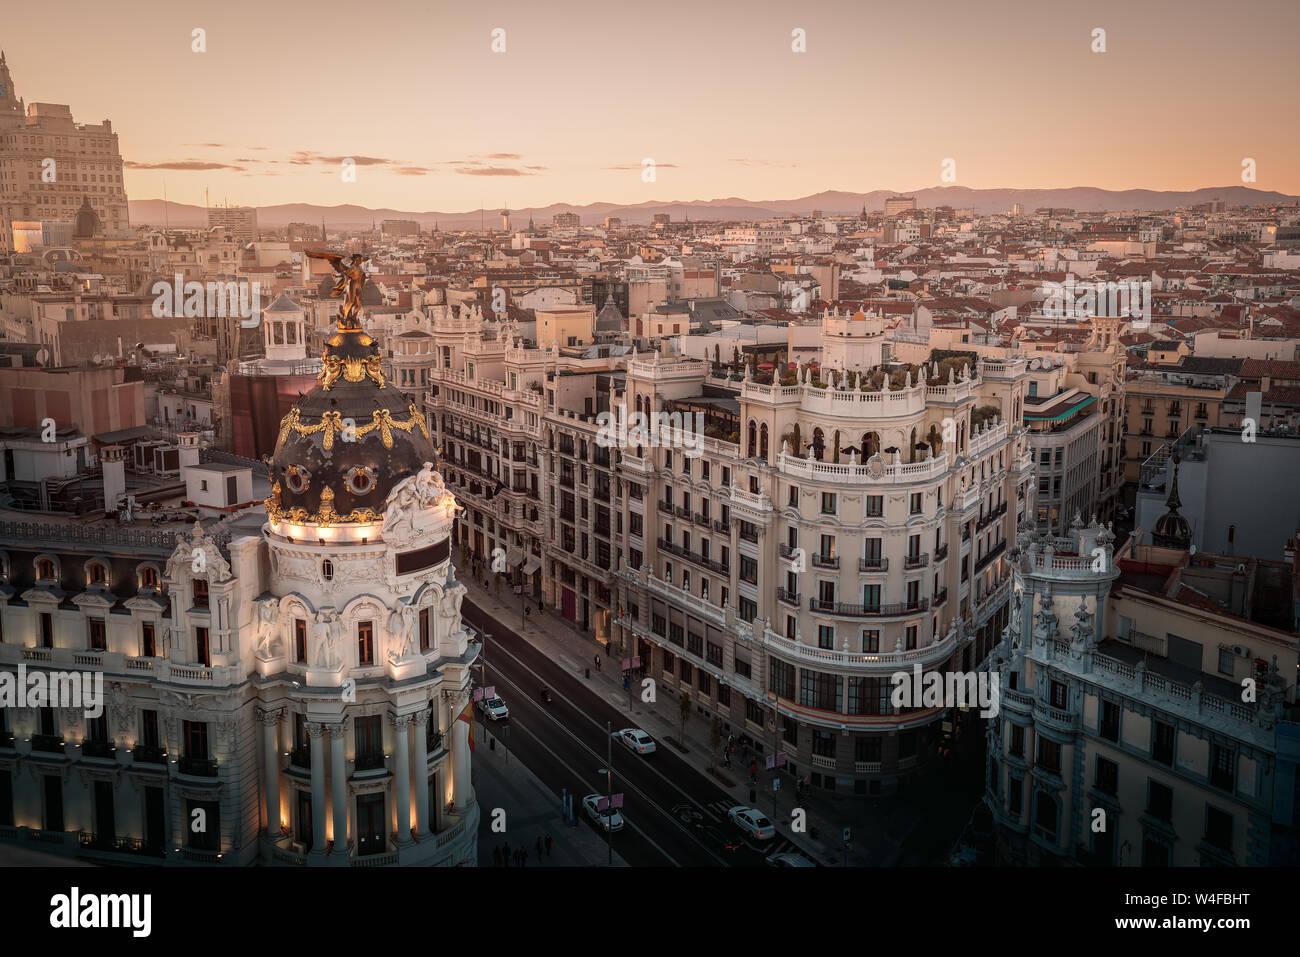 Aerial view of Gran Via Street - Madrid, Spain Stock Photo